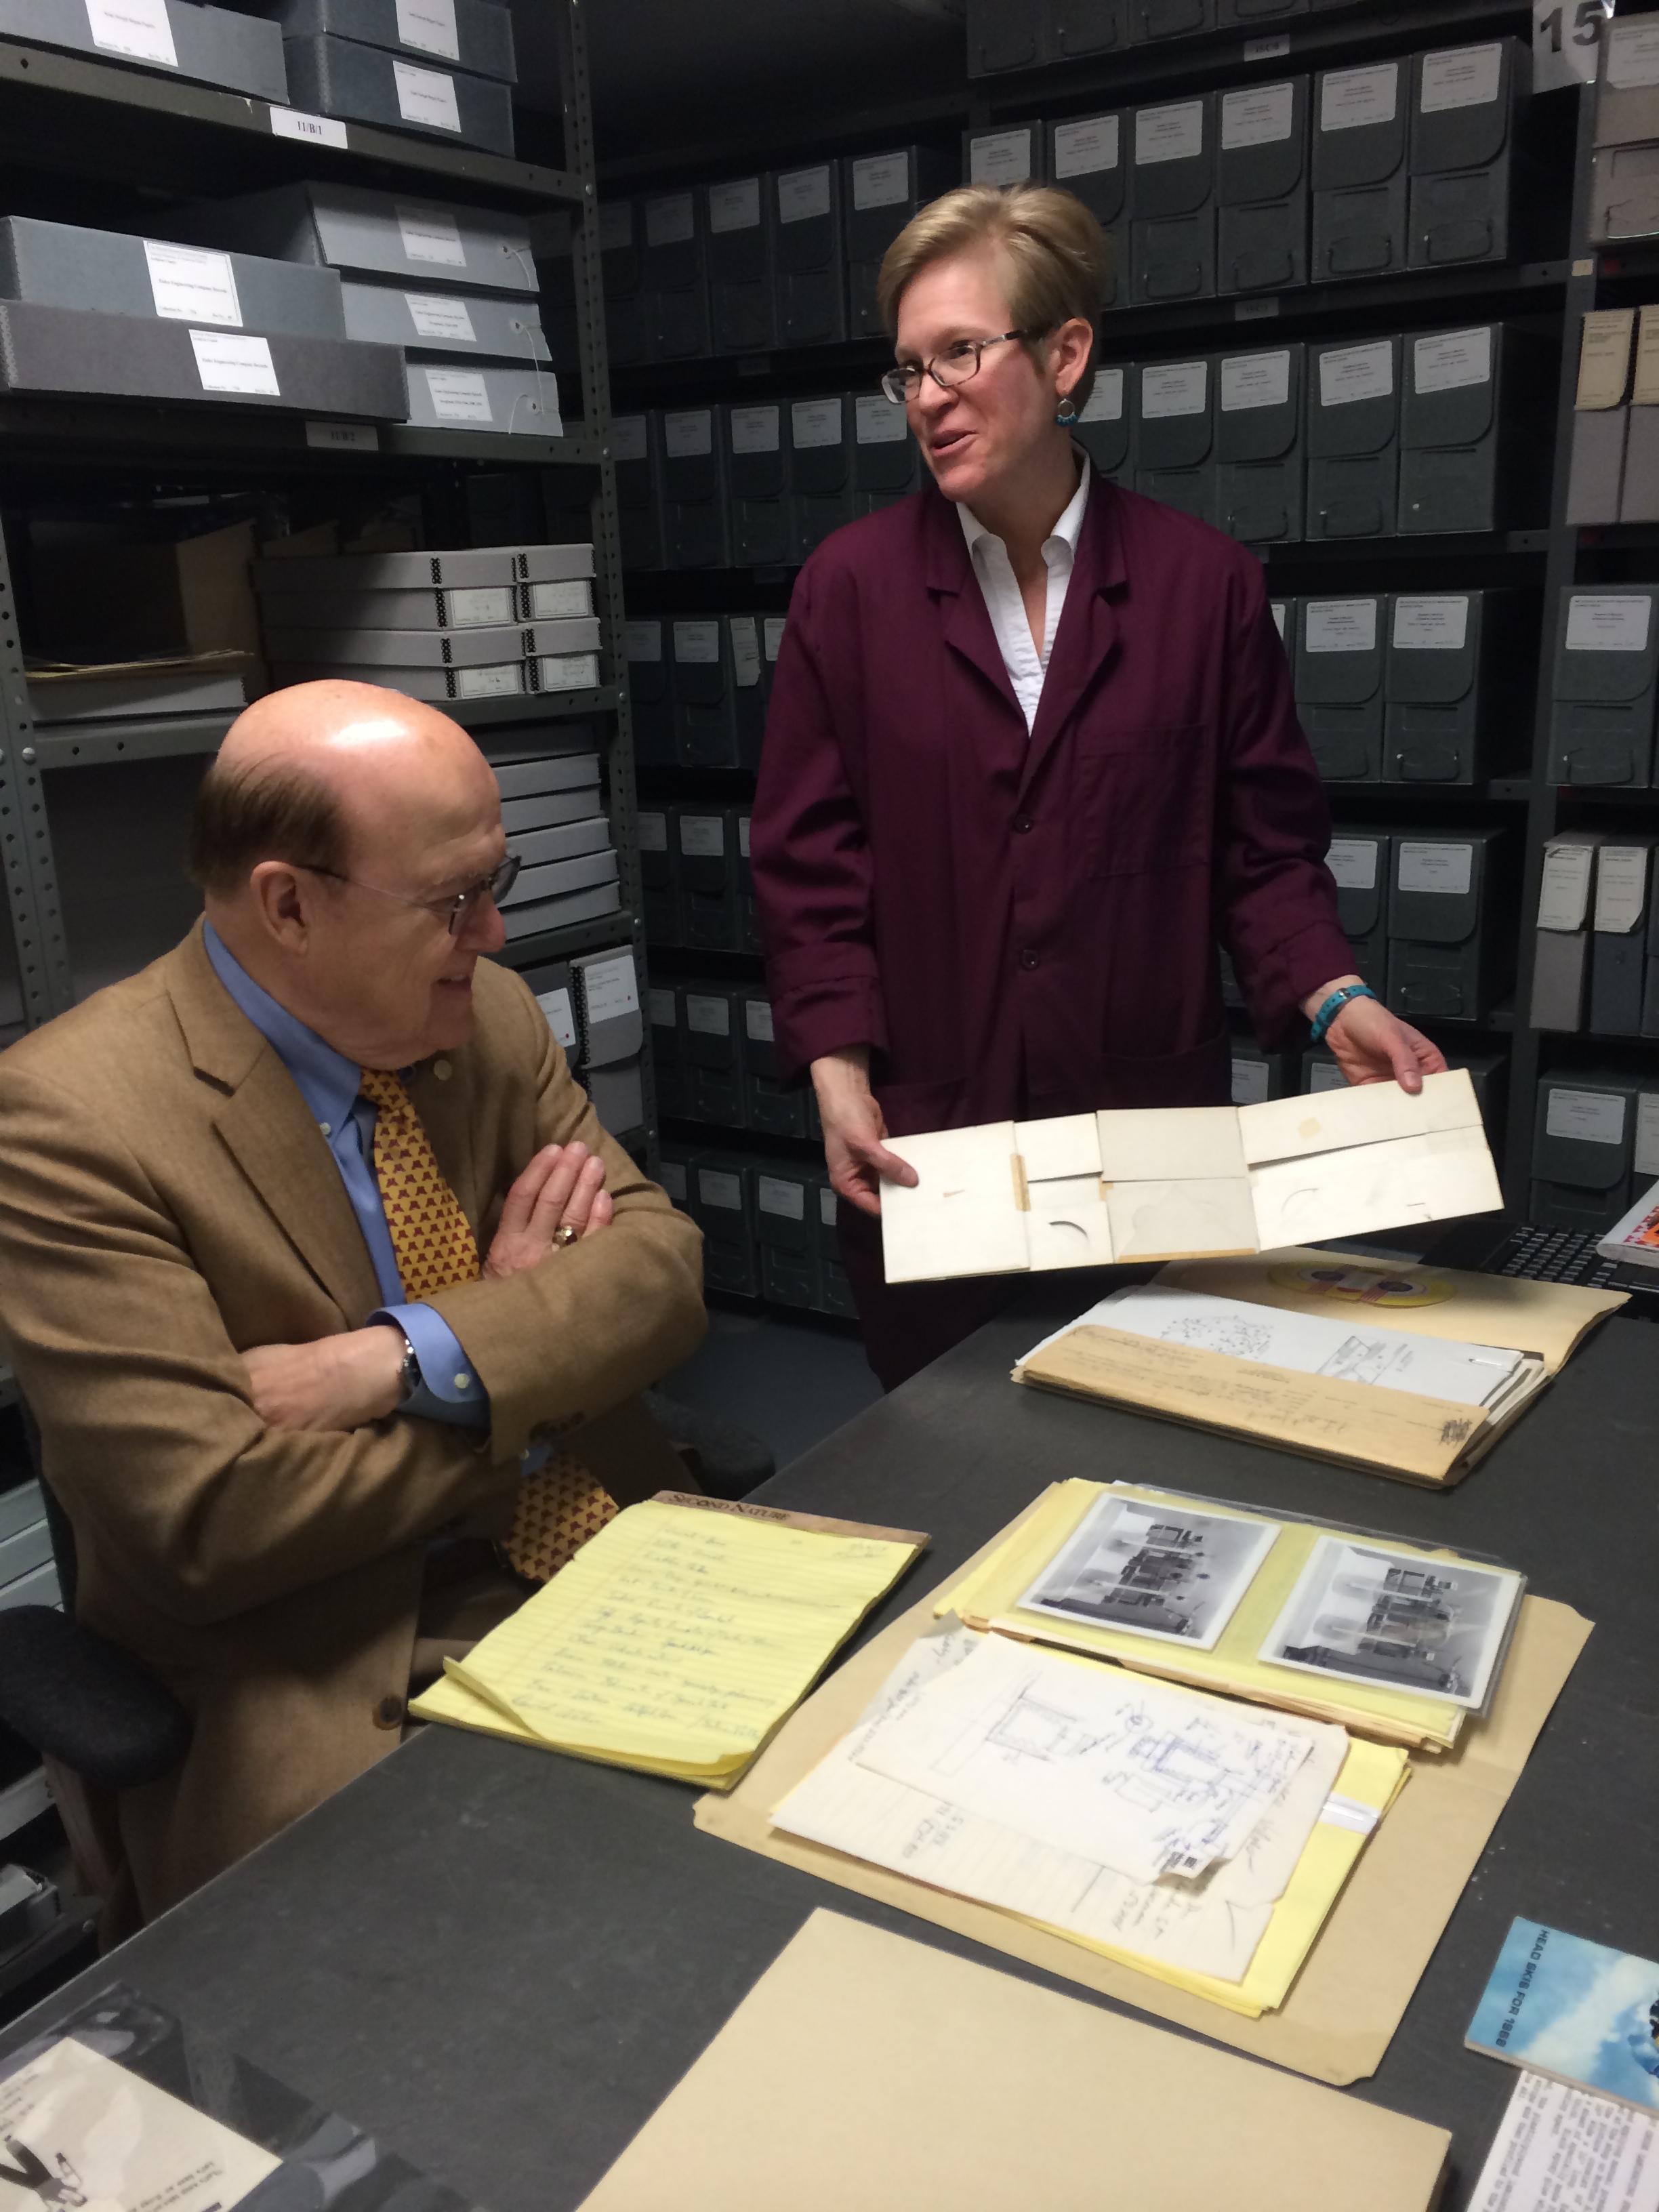 Archivist Alison Oswald shows Manny Villafaña archival documents.